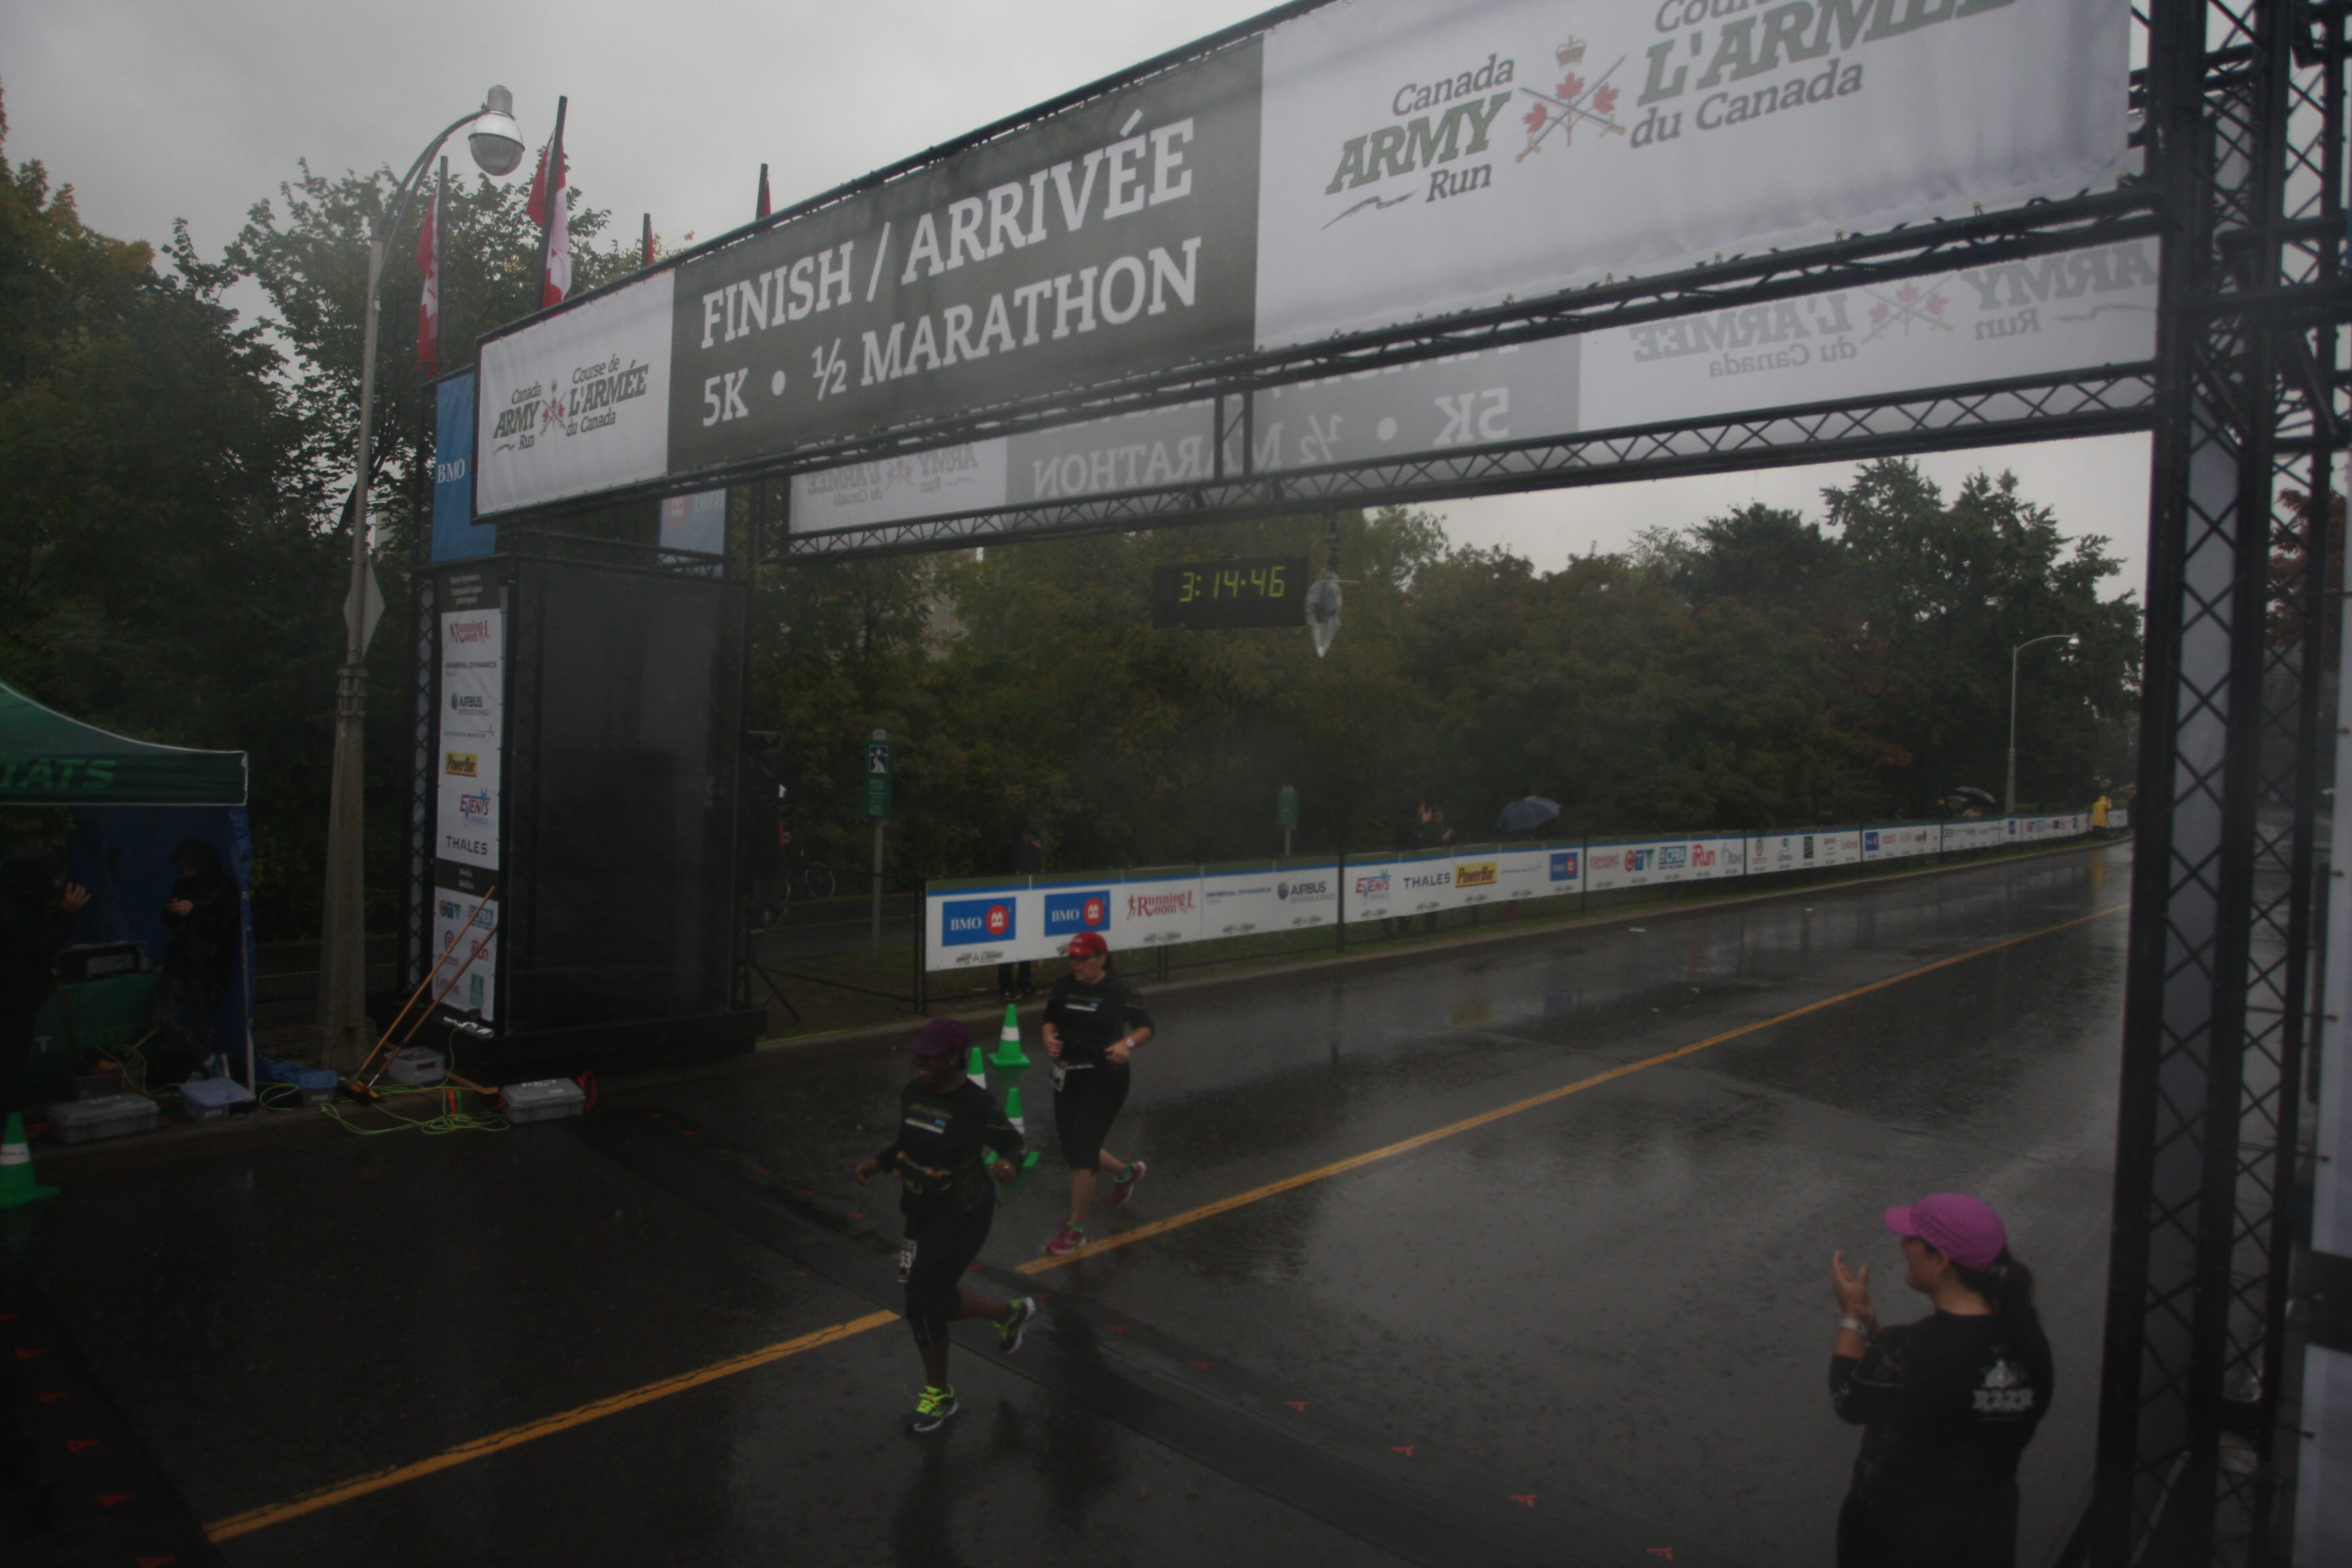 2014-09-21   2014 Canada Army Run / Course de l''Armée du Canada